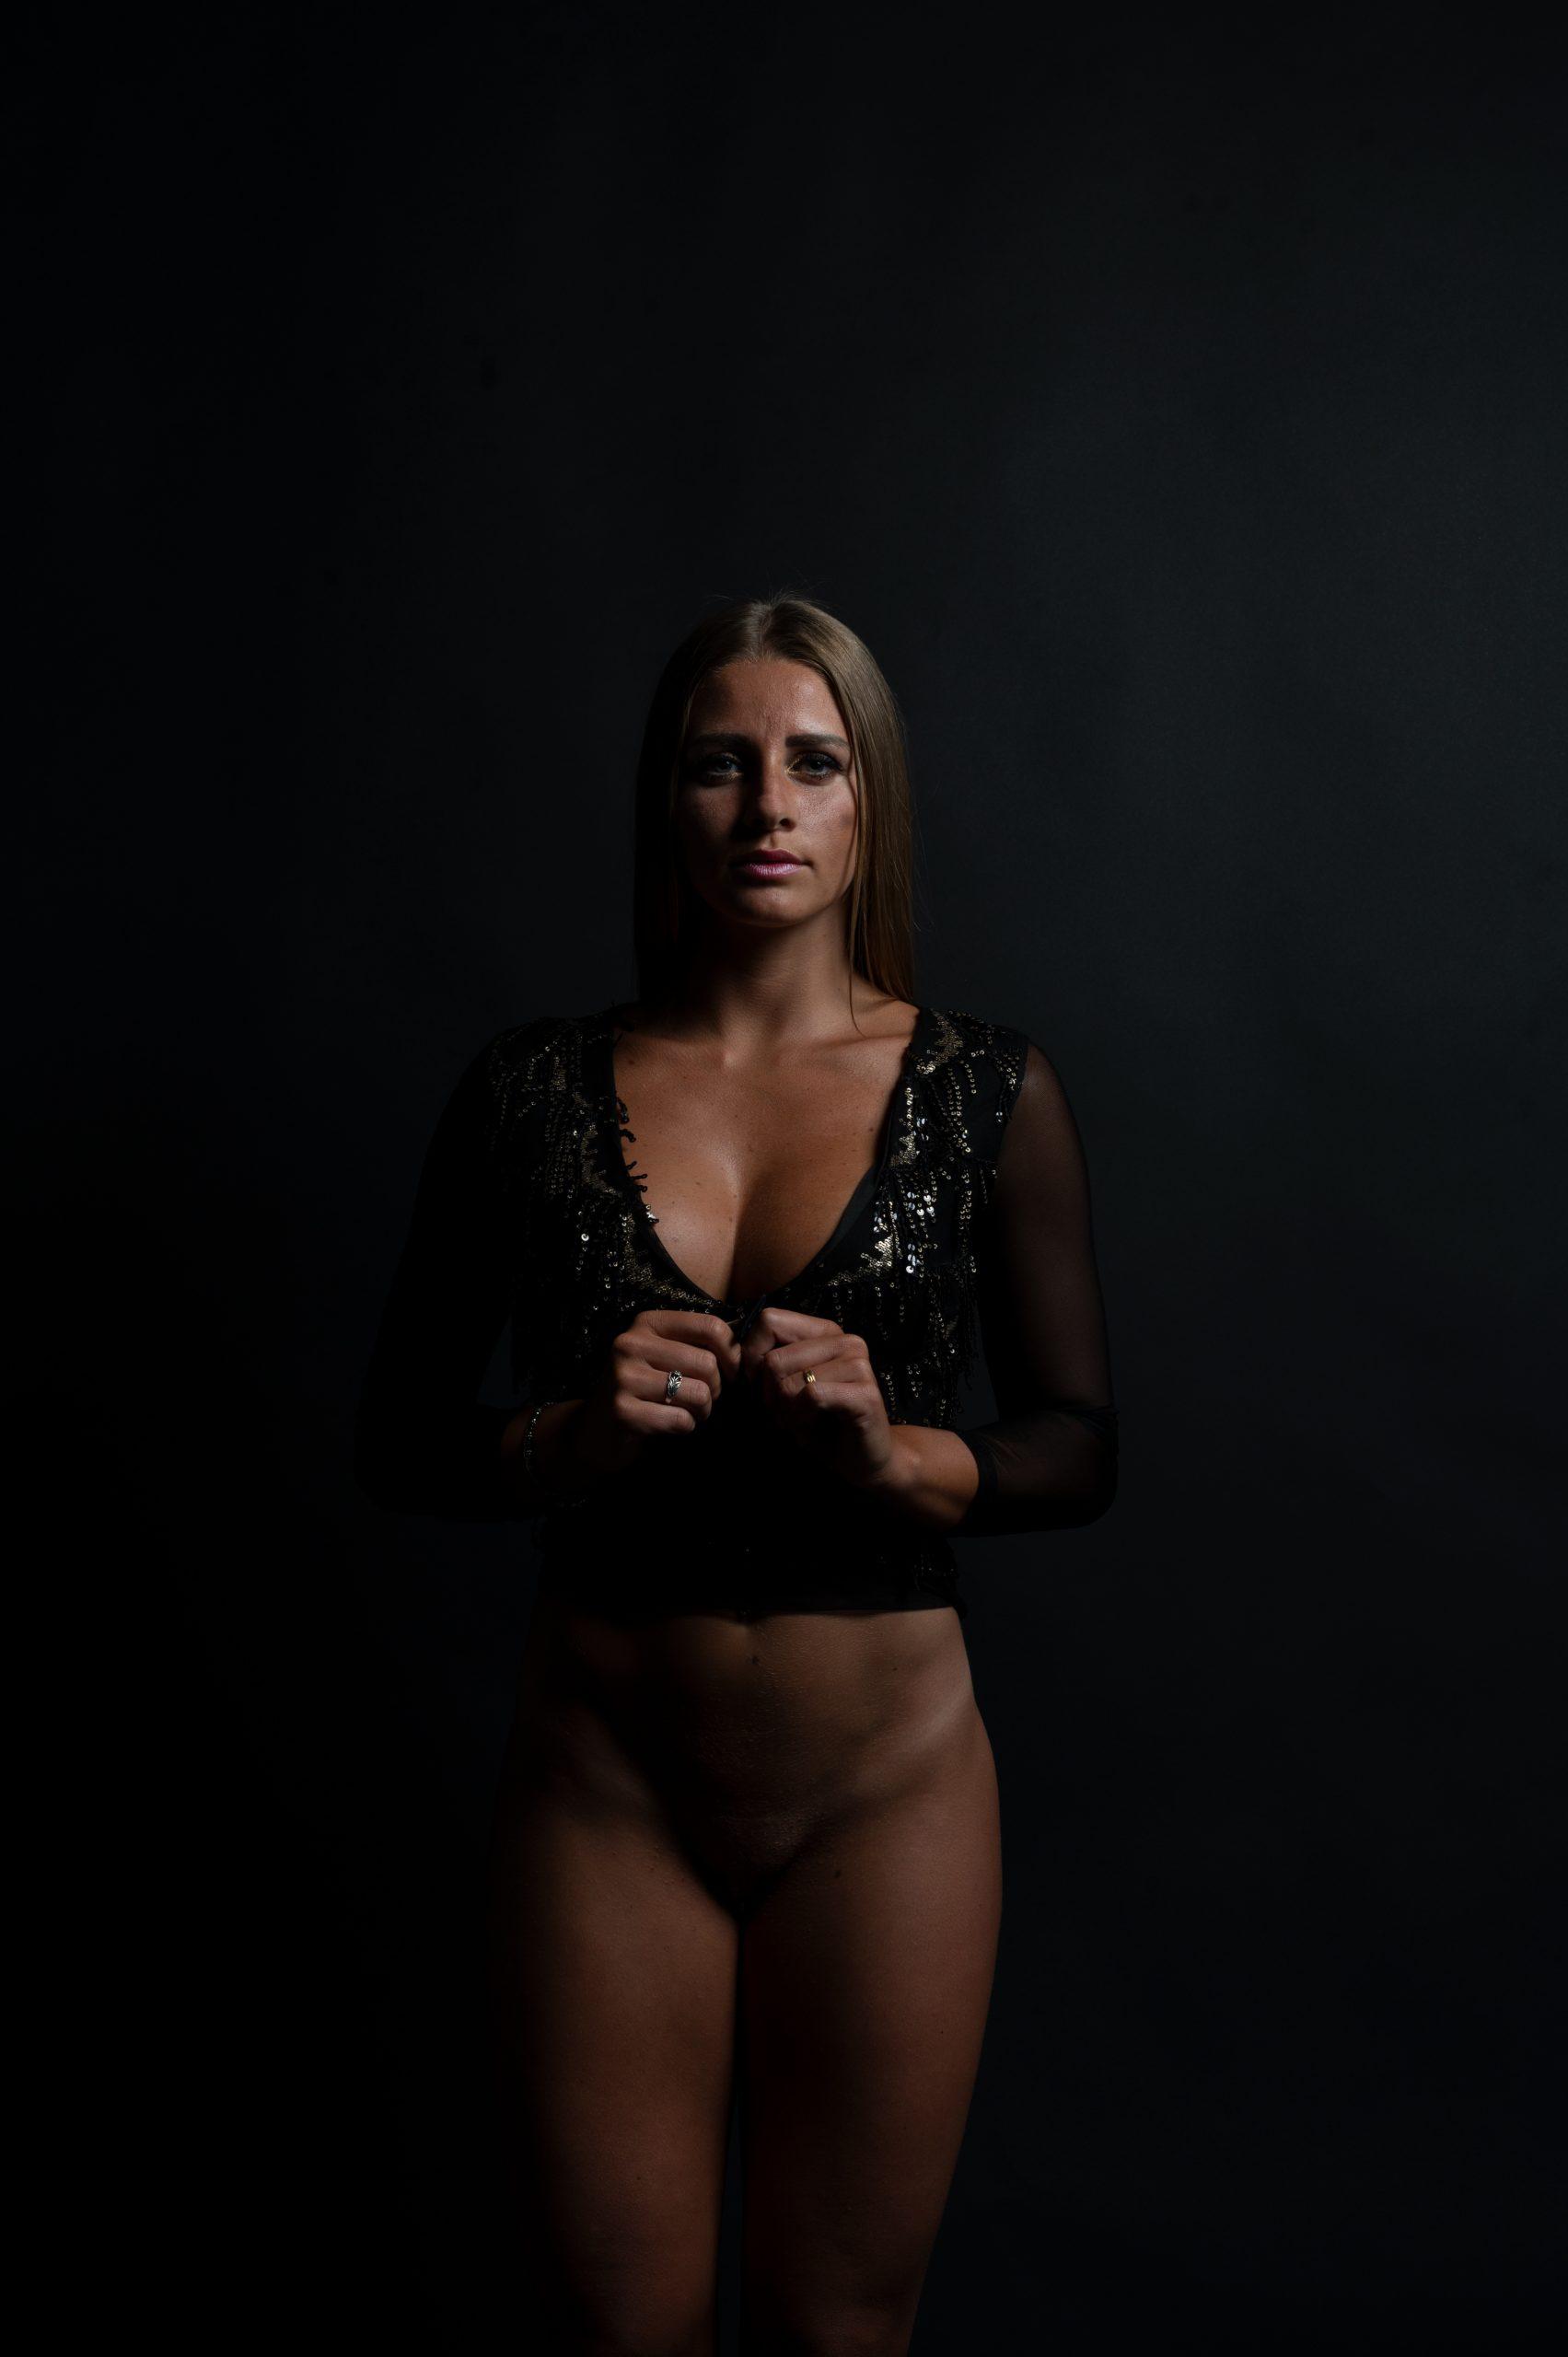 Valentina_Zamperoni_059-1